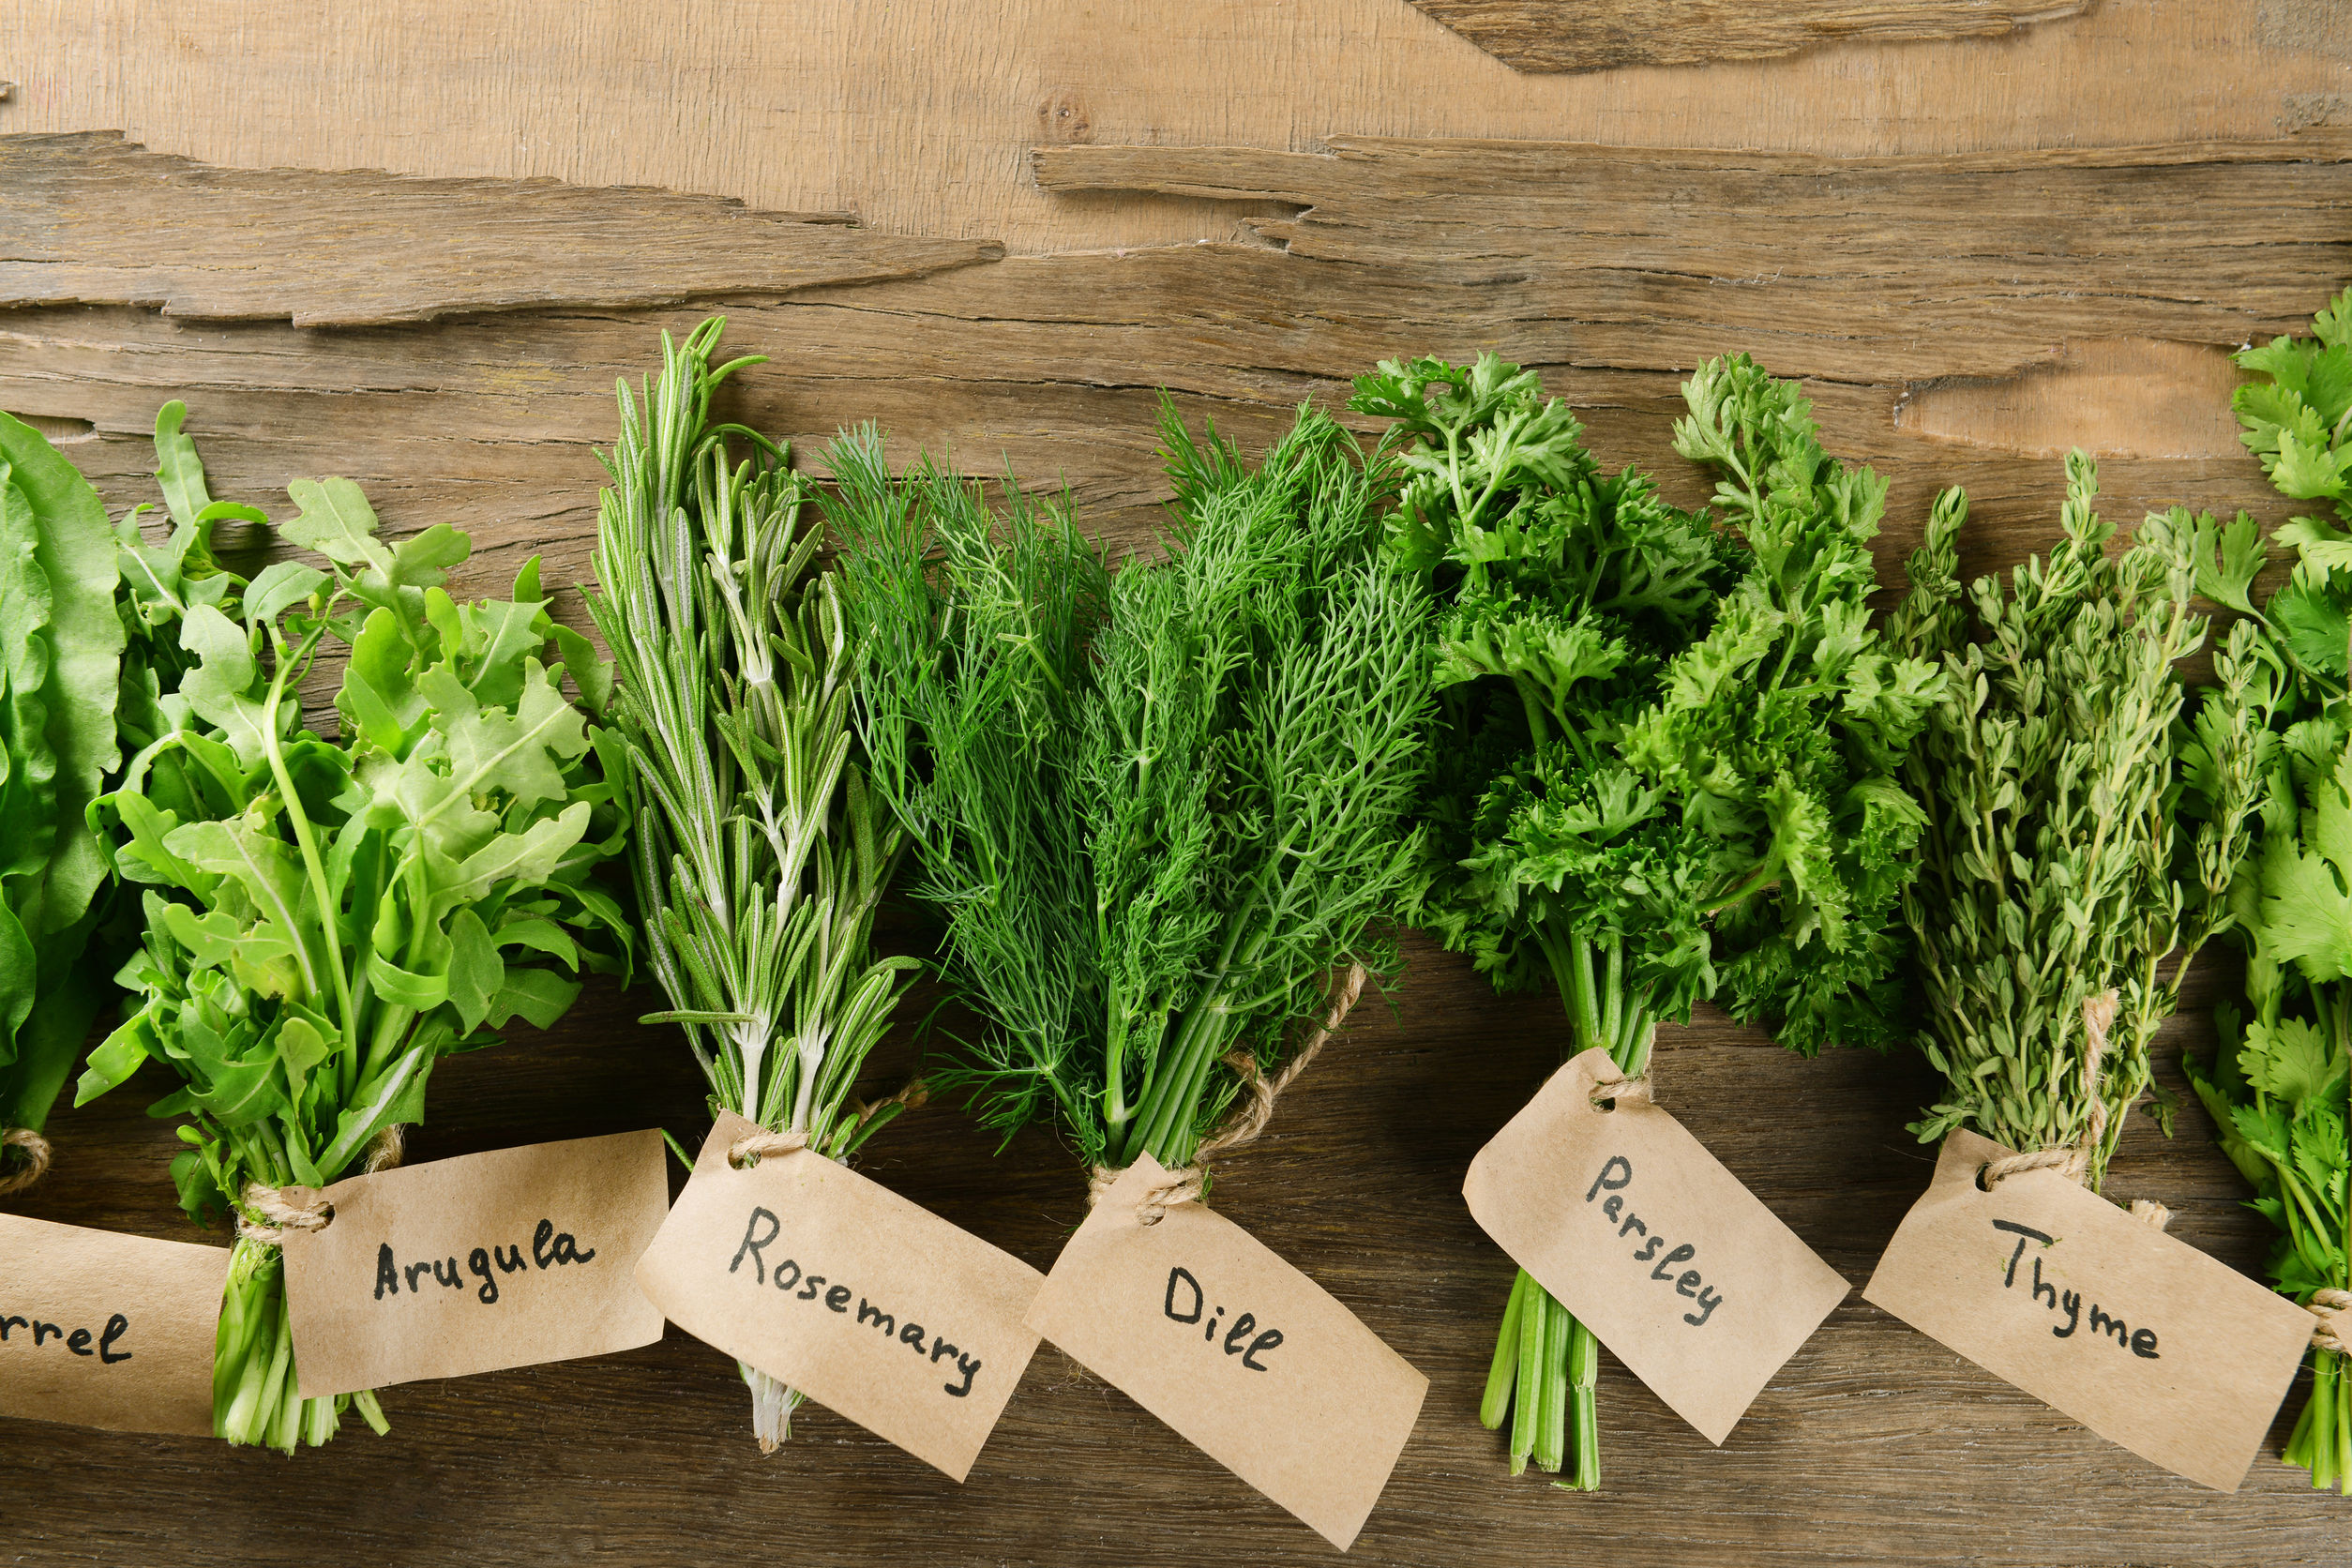 8 easiest herbs to grow in your kitchen garden - iproperty.com.my